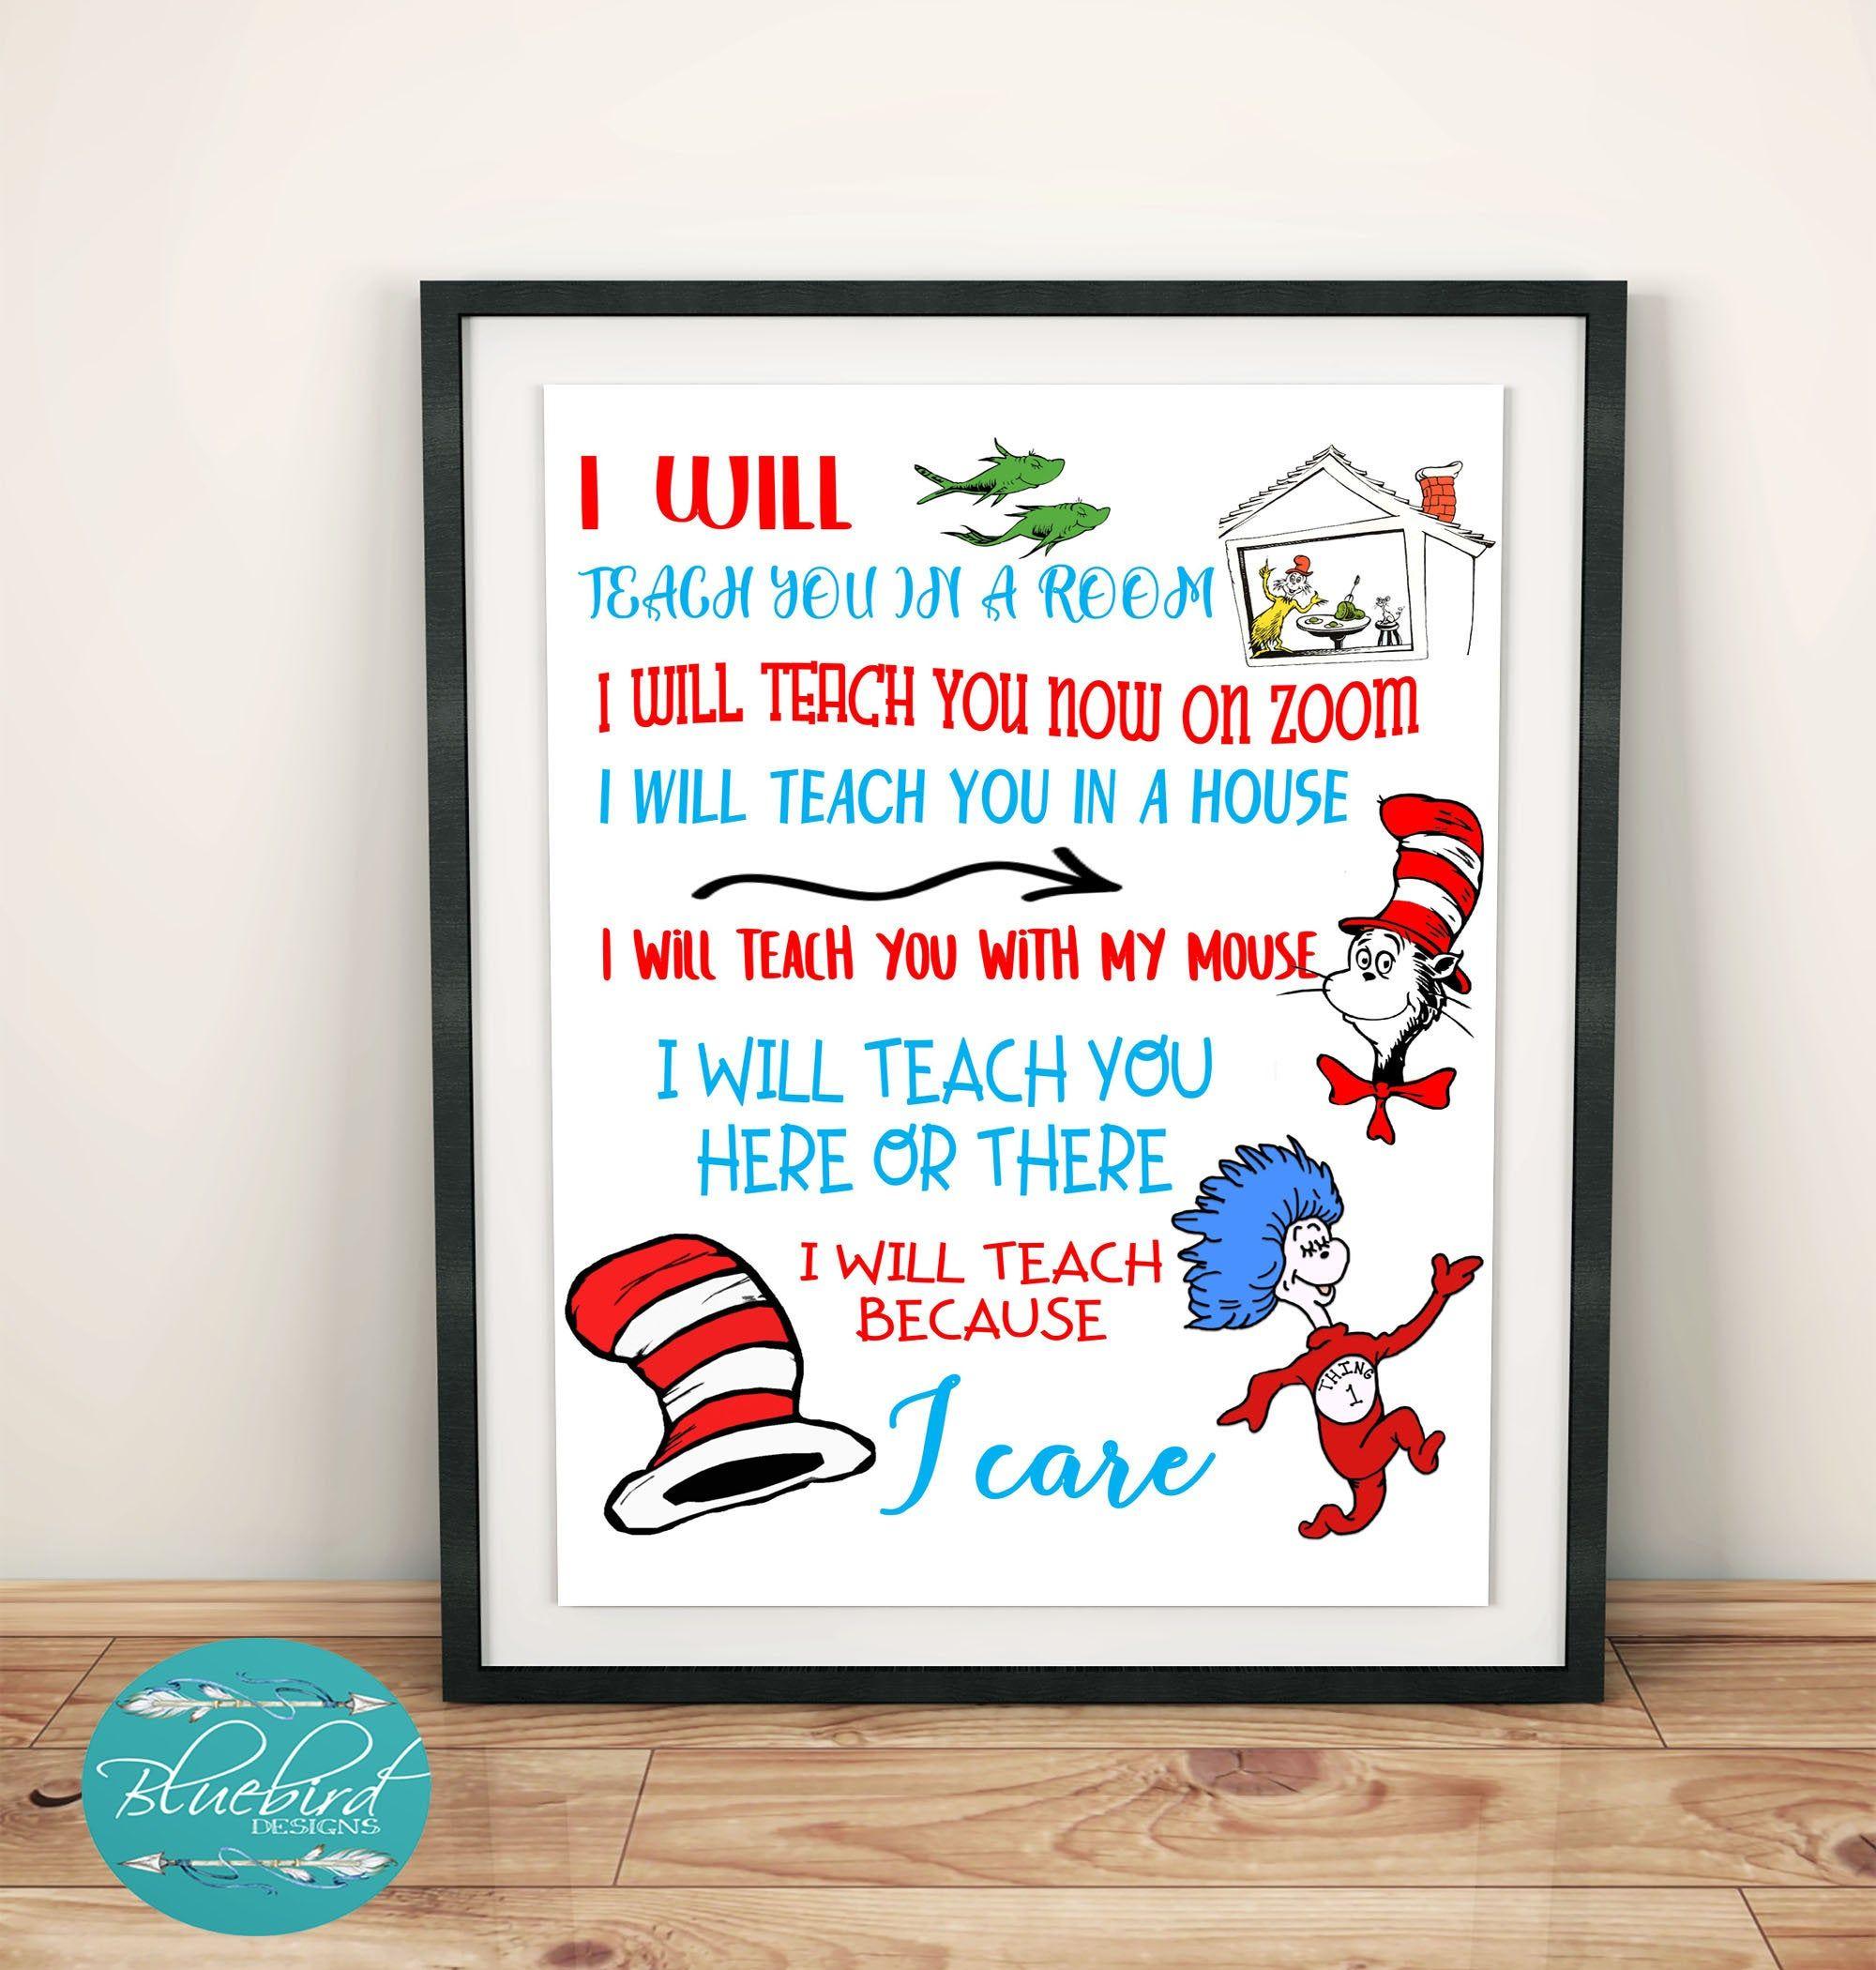 Dr Seuss Teacher Zoom Home Education Thank You Svg Png Jpeg Files Crafts Cricut F Educator Gifts Teacher Signs Dr Seuss Images